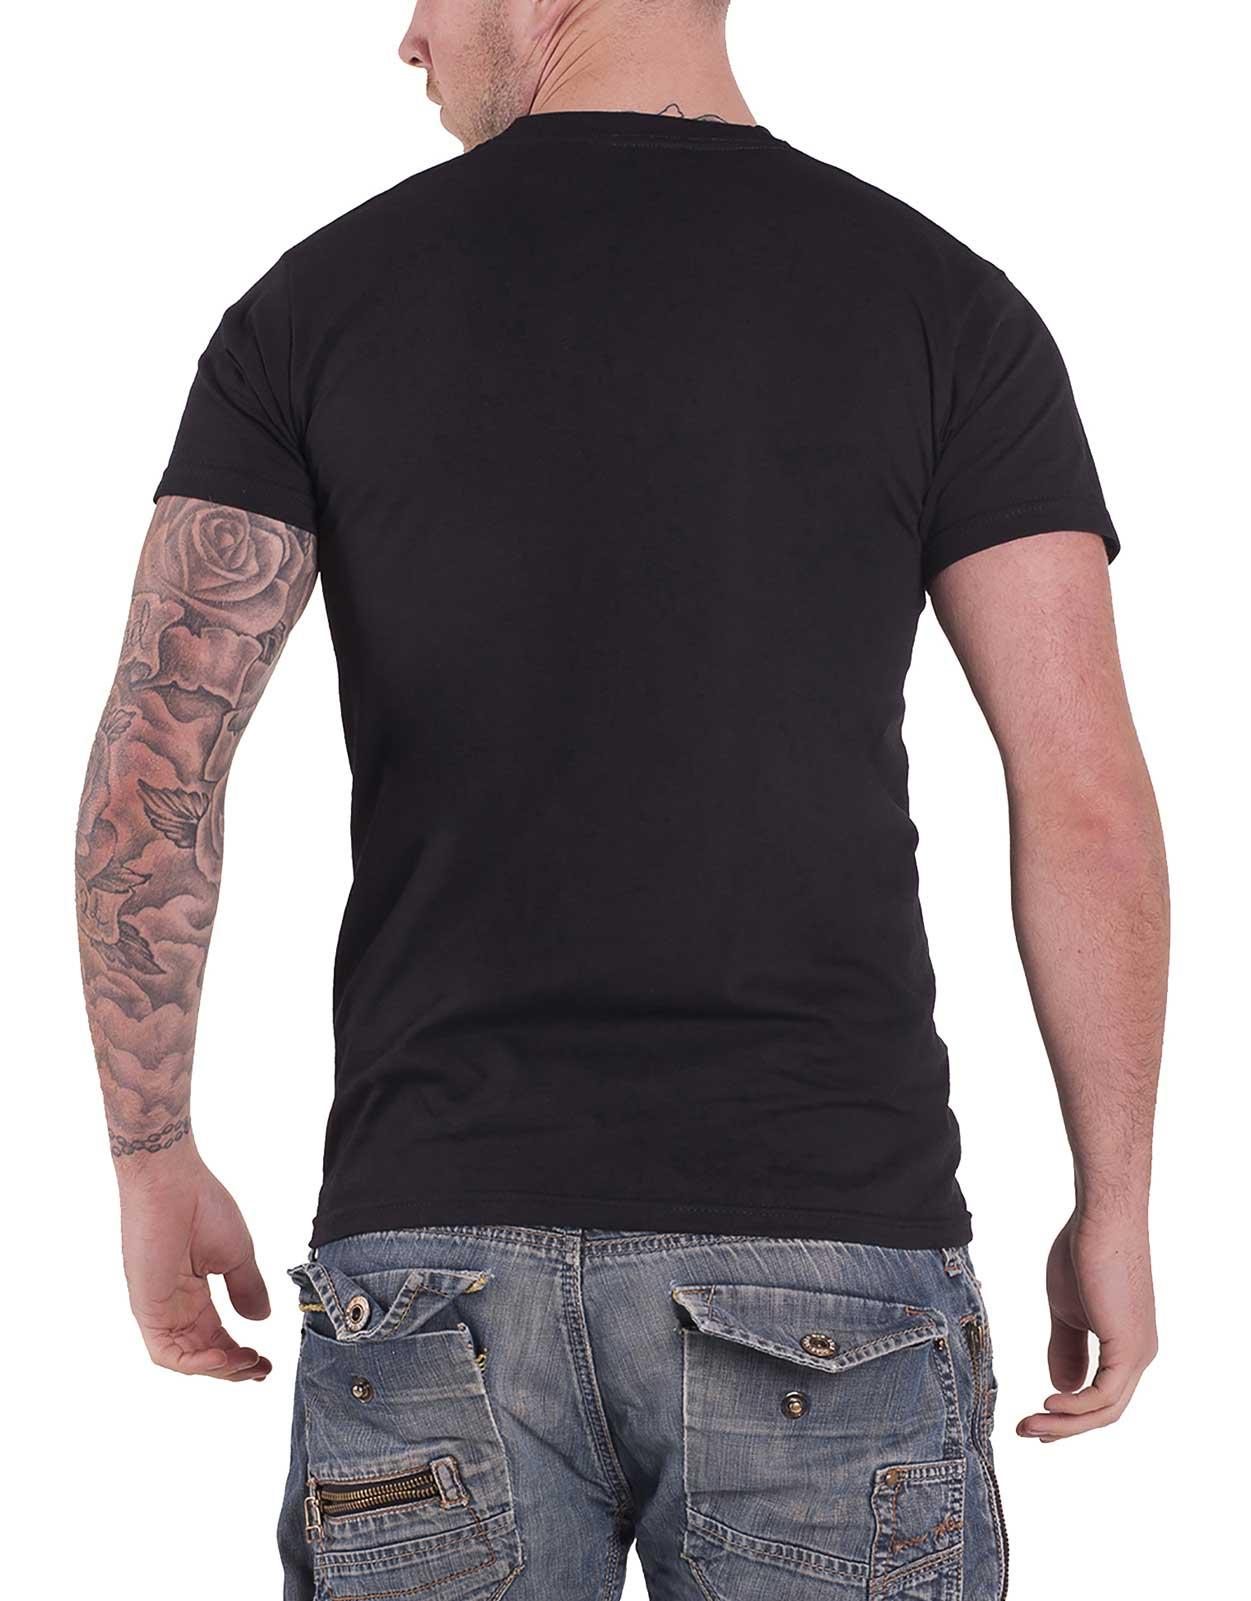 Officiel-Jimi-Hendrix-T-Shirt-Purple-Haze-Are-you-experienced-Logo-Homme-NEUF miniature 3